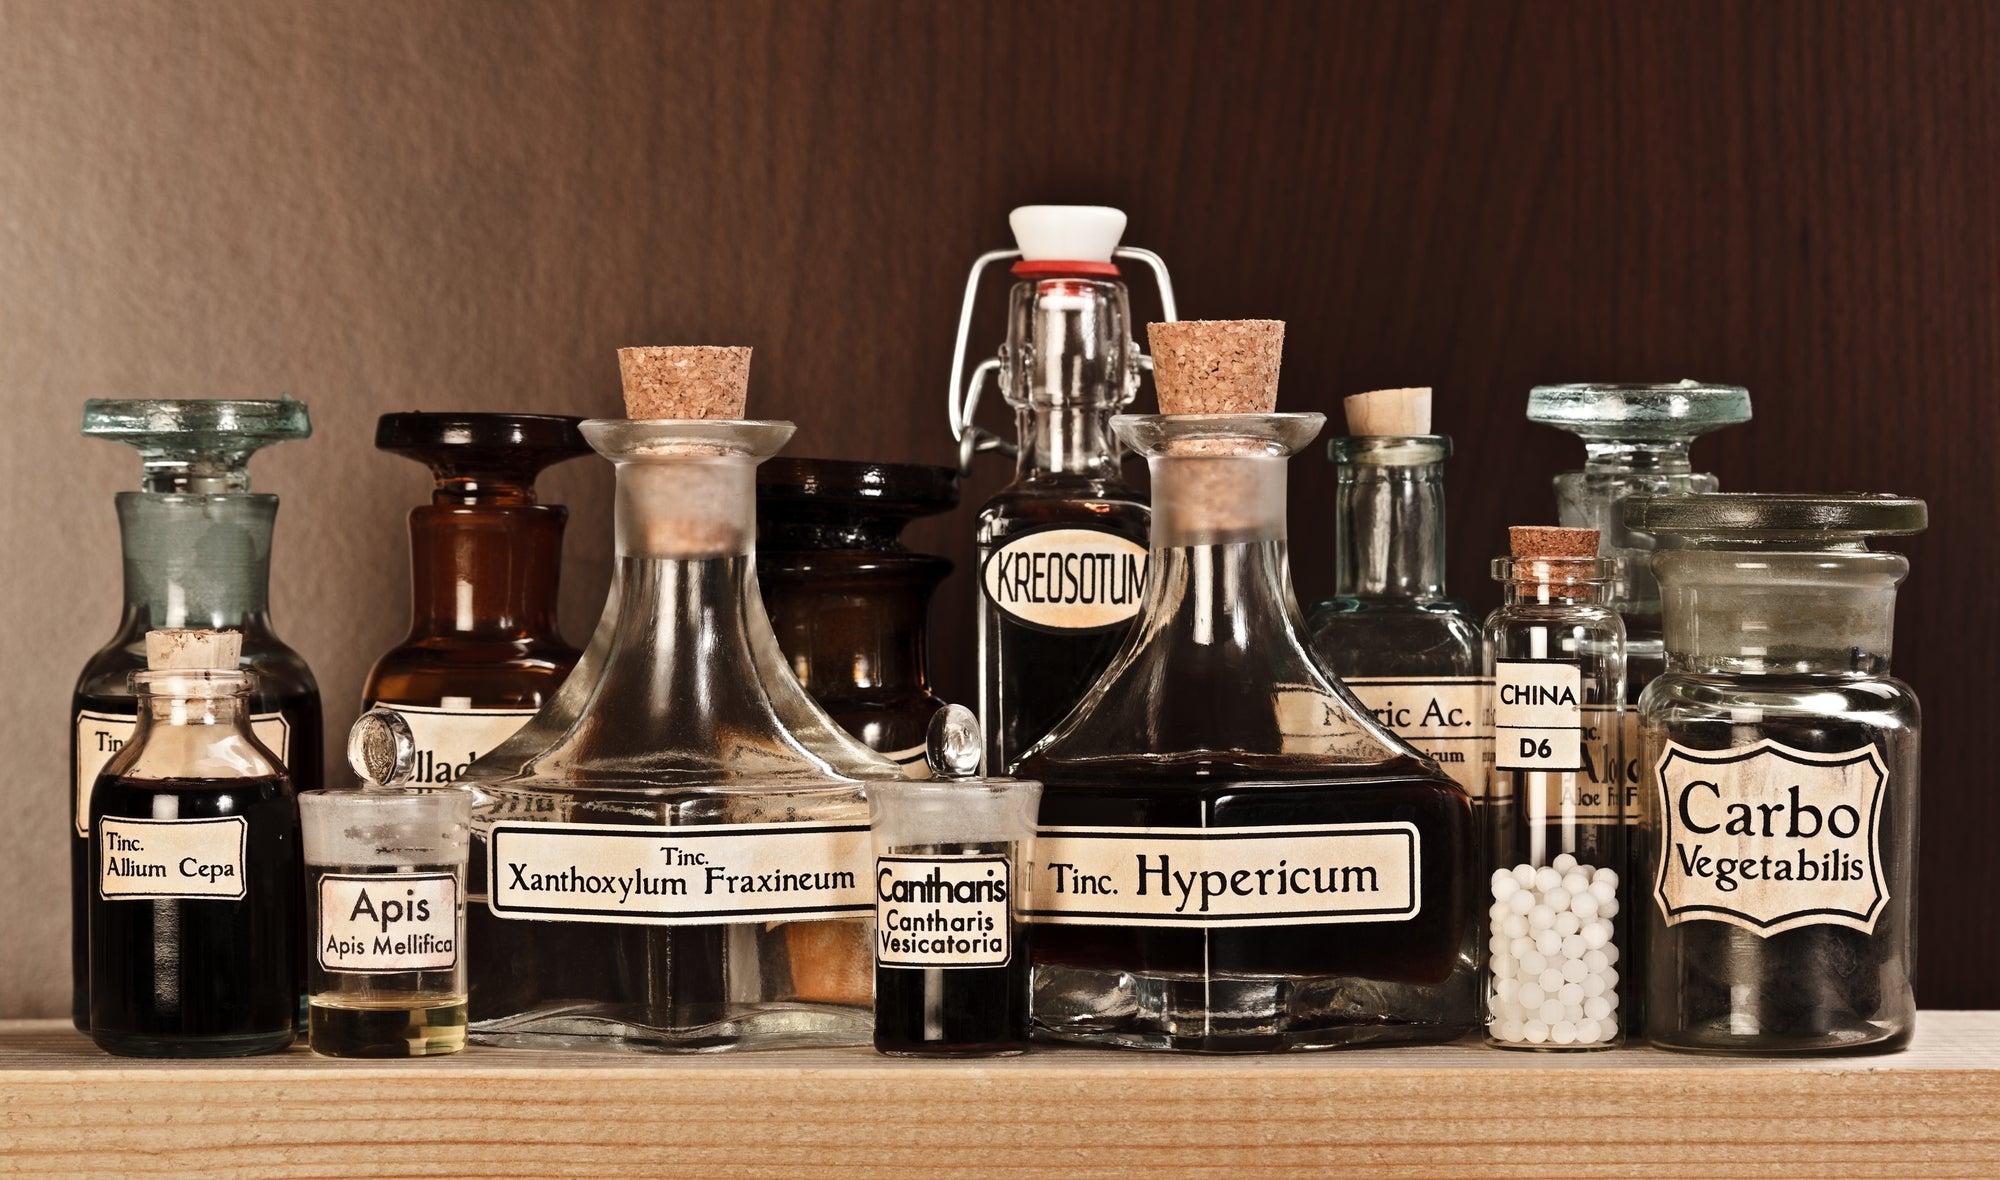 glass bottles on a shelf with handwritten labels